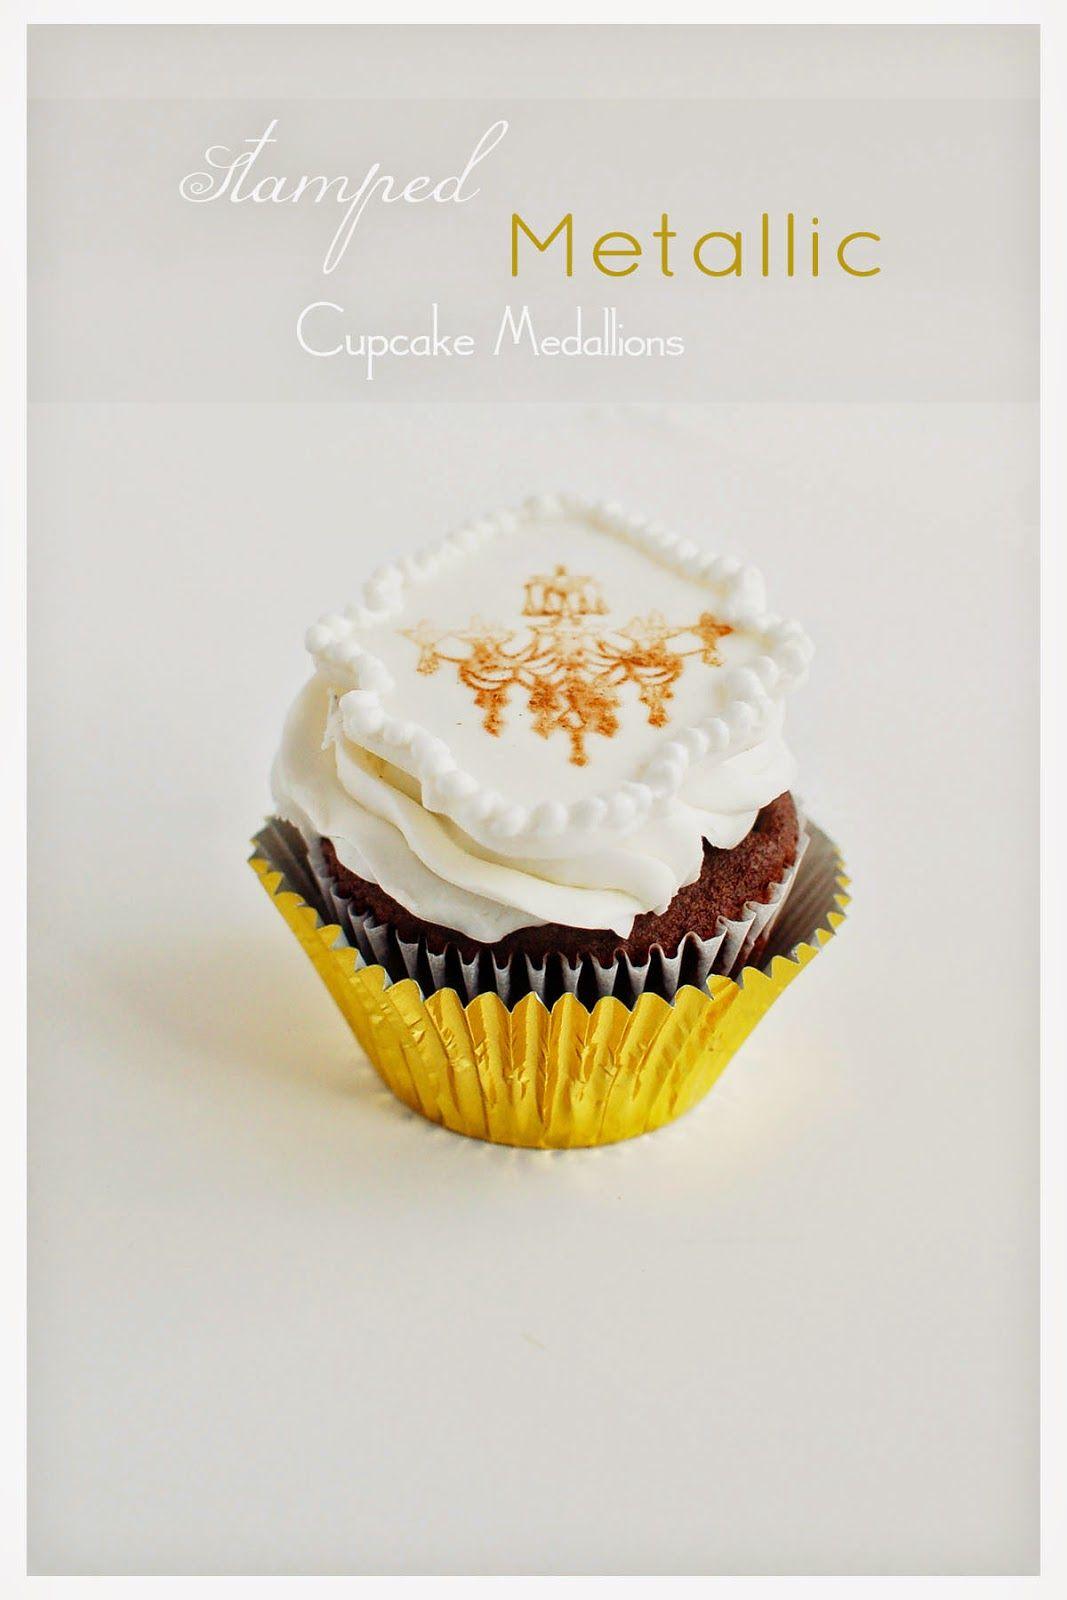 Stamped metallic cupcake medallions full tutorial on